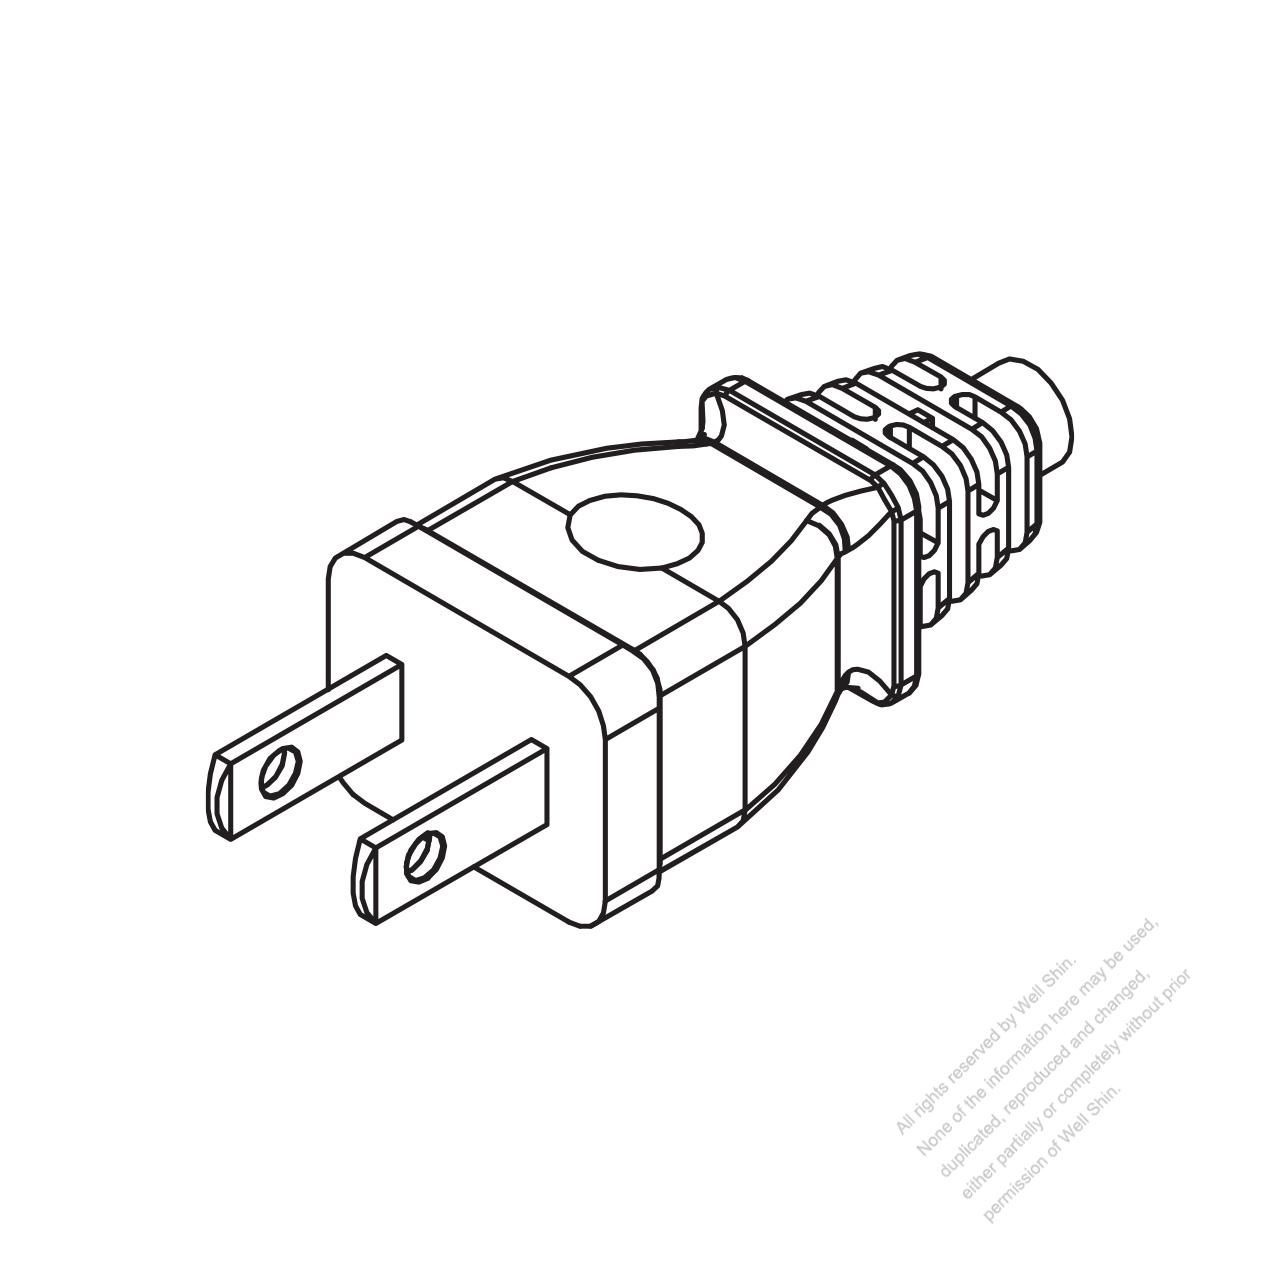 taiwan japan 2 pin 2 wire straight ac plug 2 5a 7a 9a 11a 15a 125v Electrical Connector Wiring Diagram taiwan japan 2 pin 2 wire straight ac plug 2 5a 7a